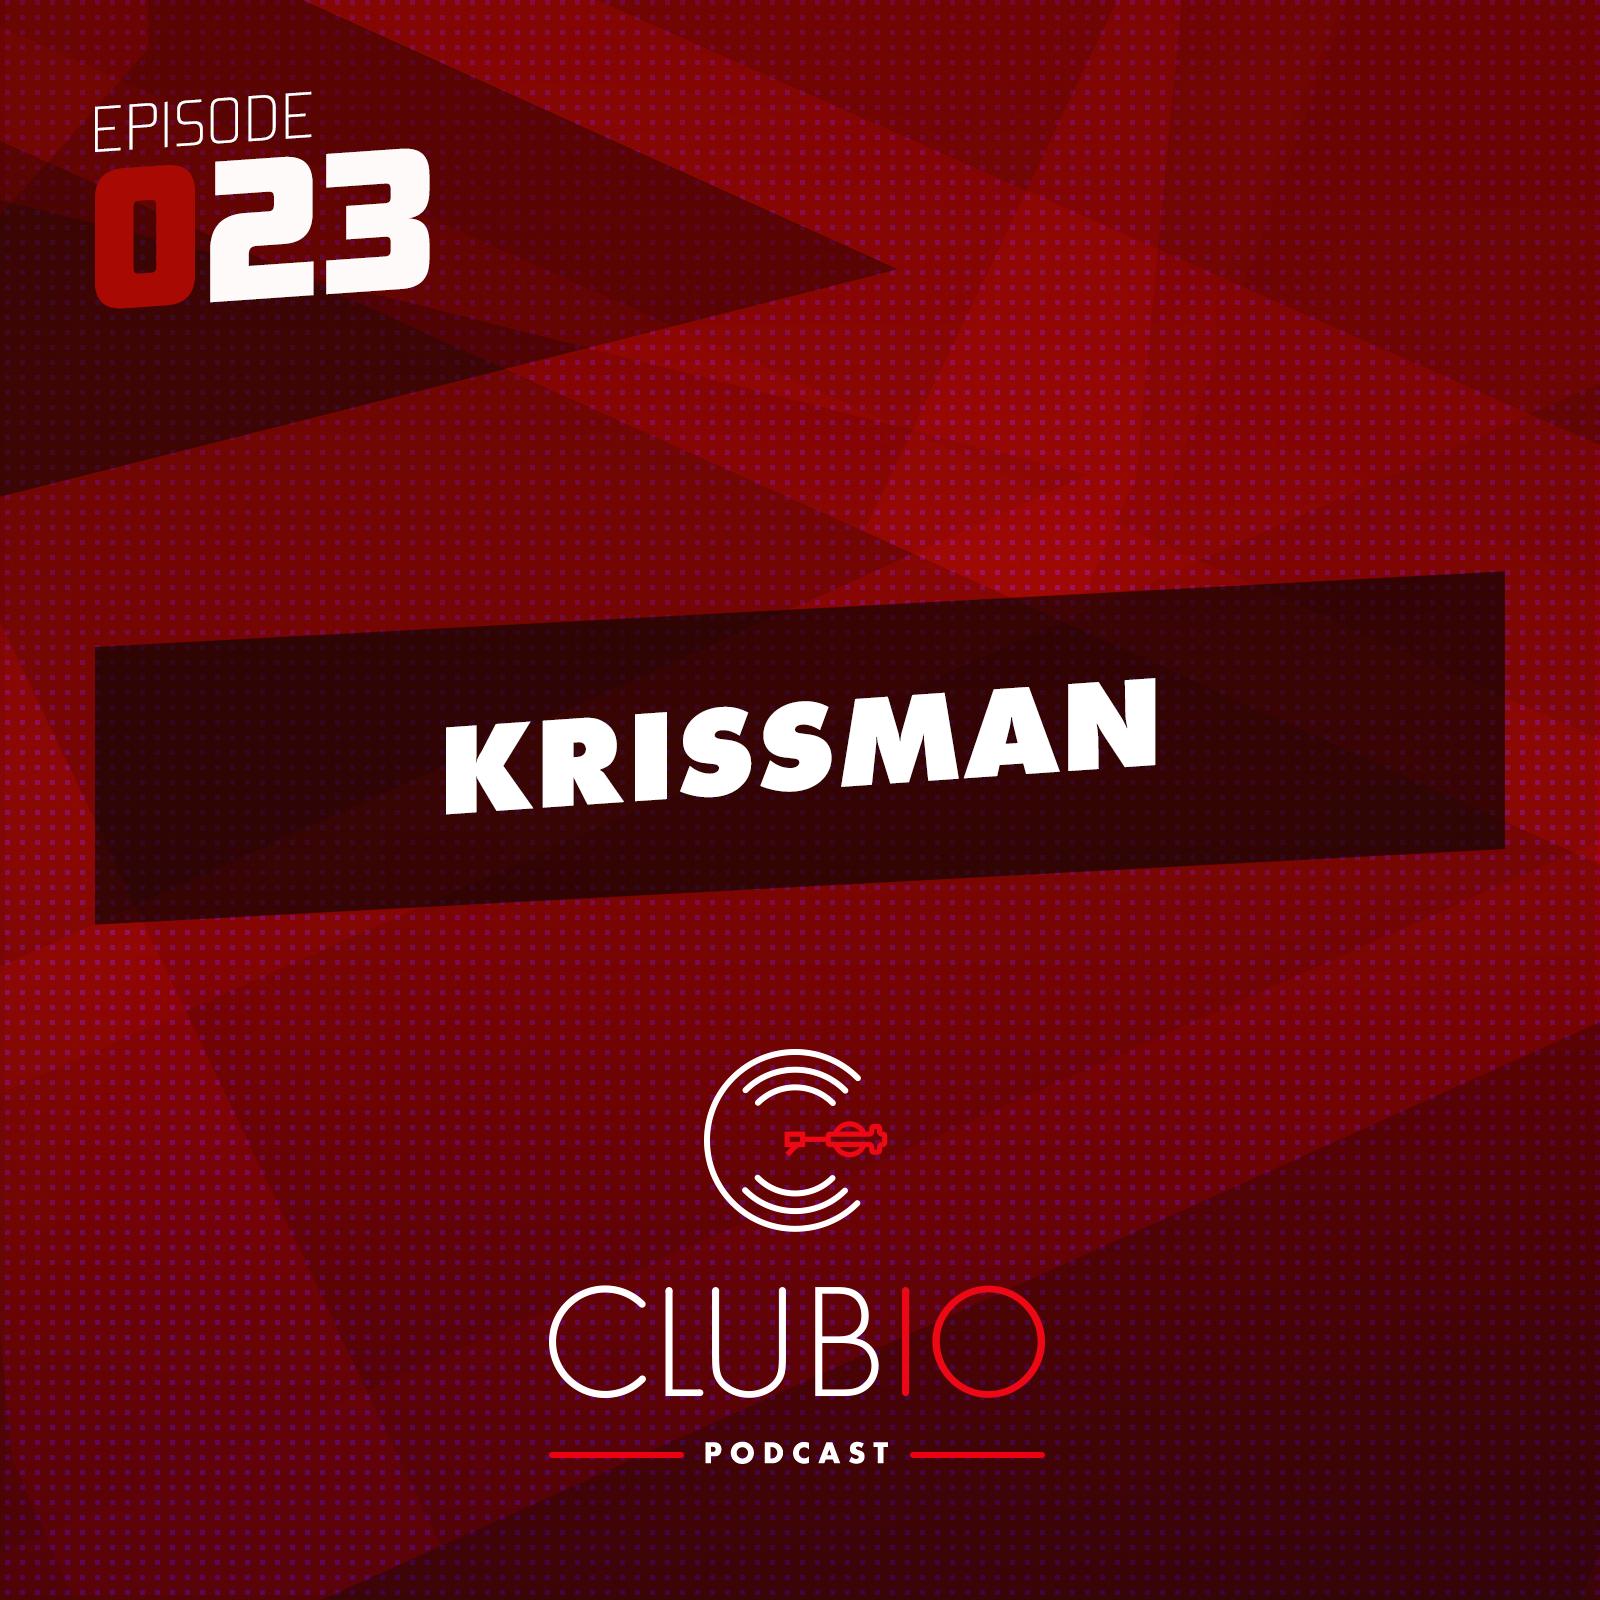 Clubio Podcast 023 - KrissMan